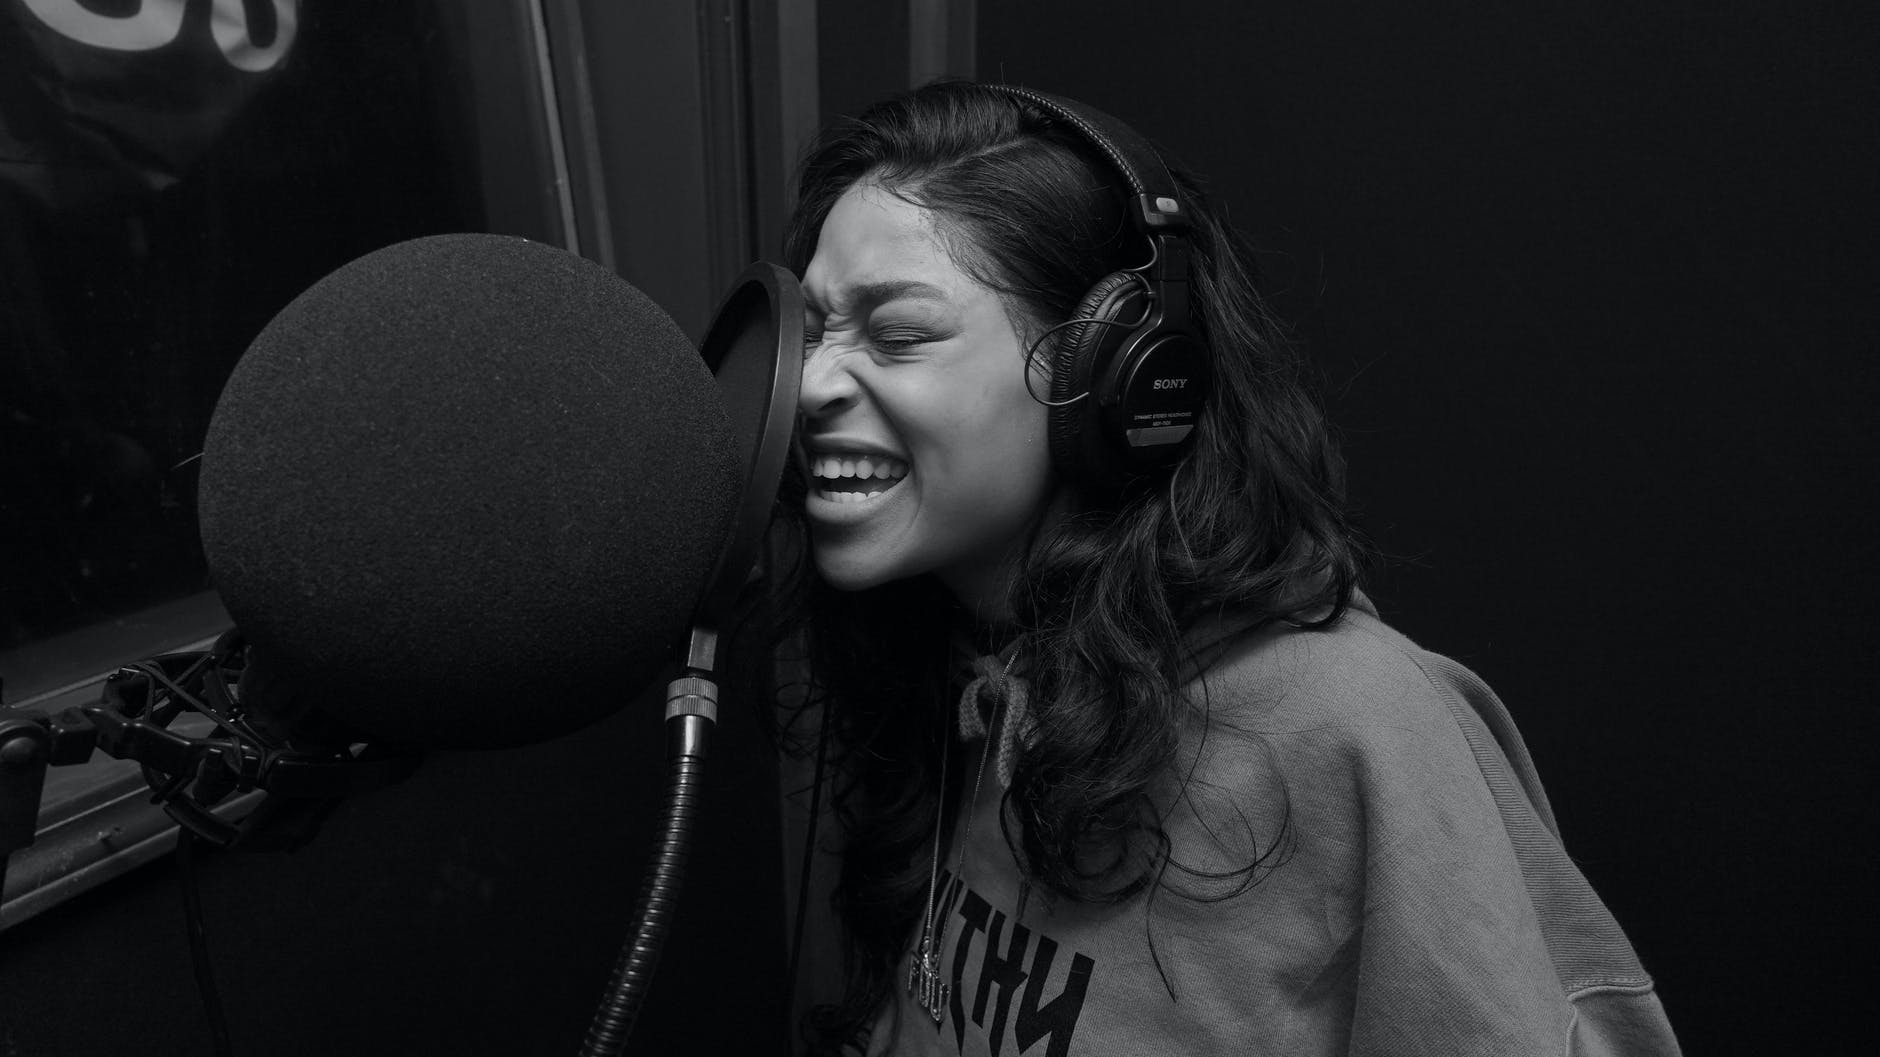 woman in gray crew neck shirt singing while wearing black headphones